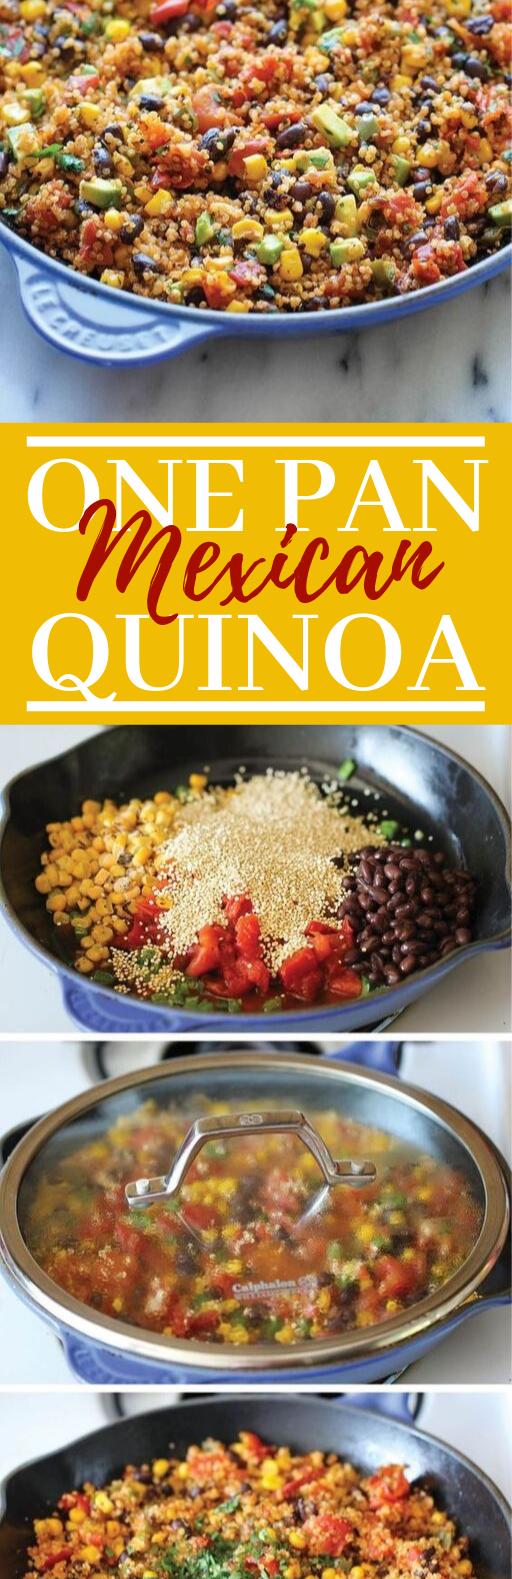 One Pan Mexican Quinoa #vegetarian #healthy